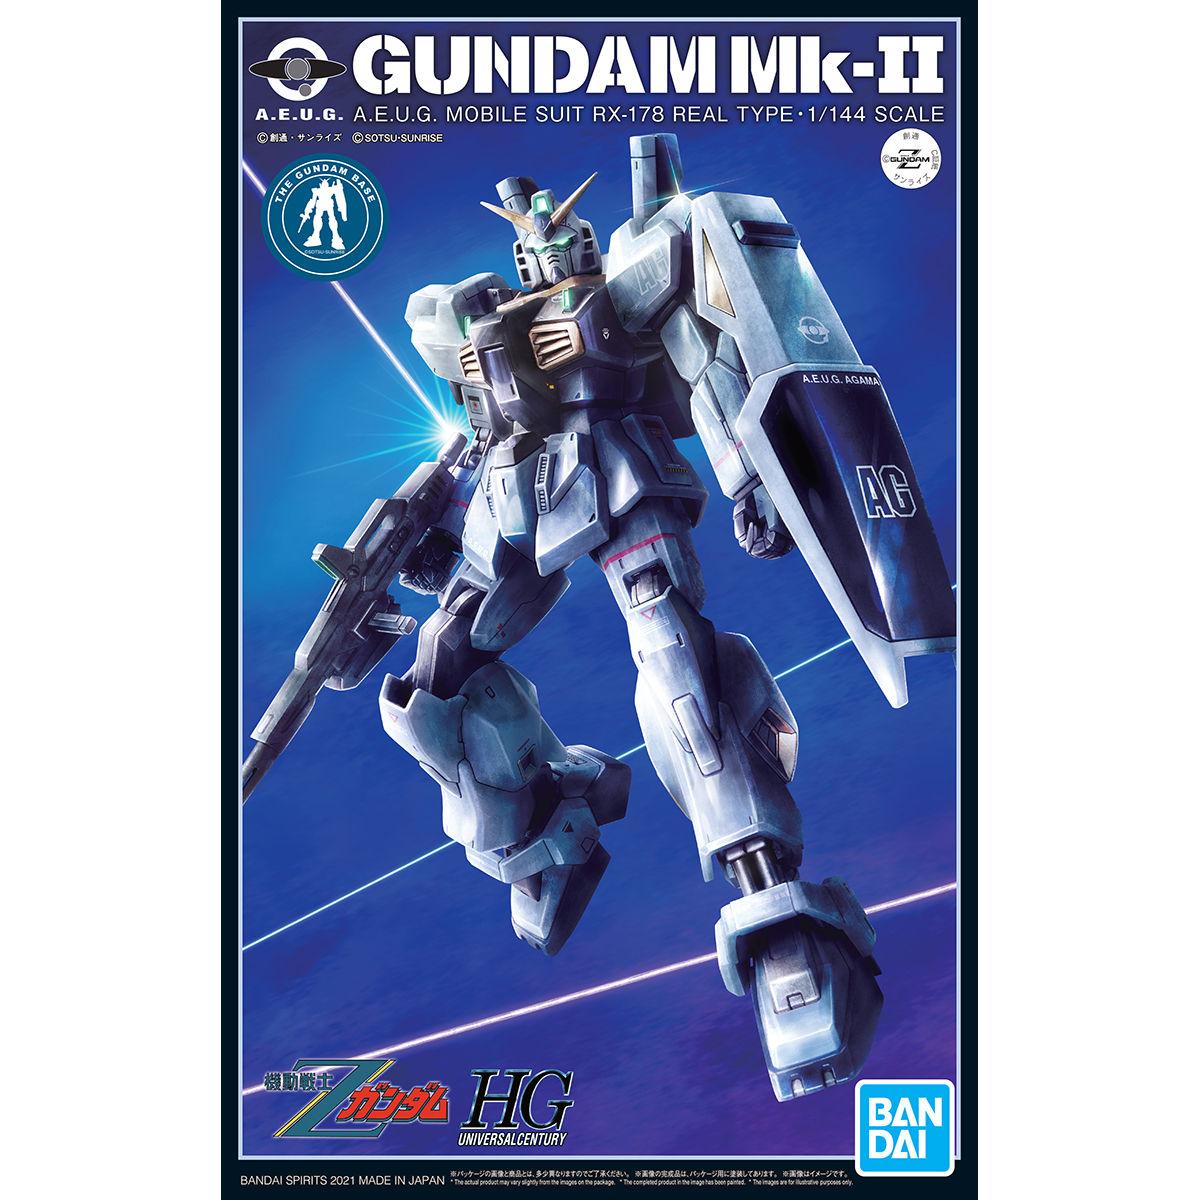 HG 1/144 ガンダムベース限定 ガンダムMk-II(21st CENTURY REAL TYPE Ver.) 商品画像